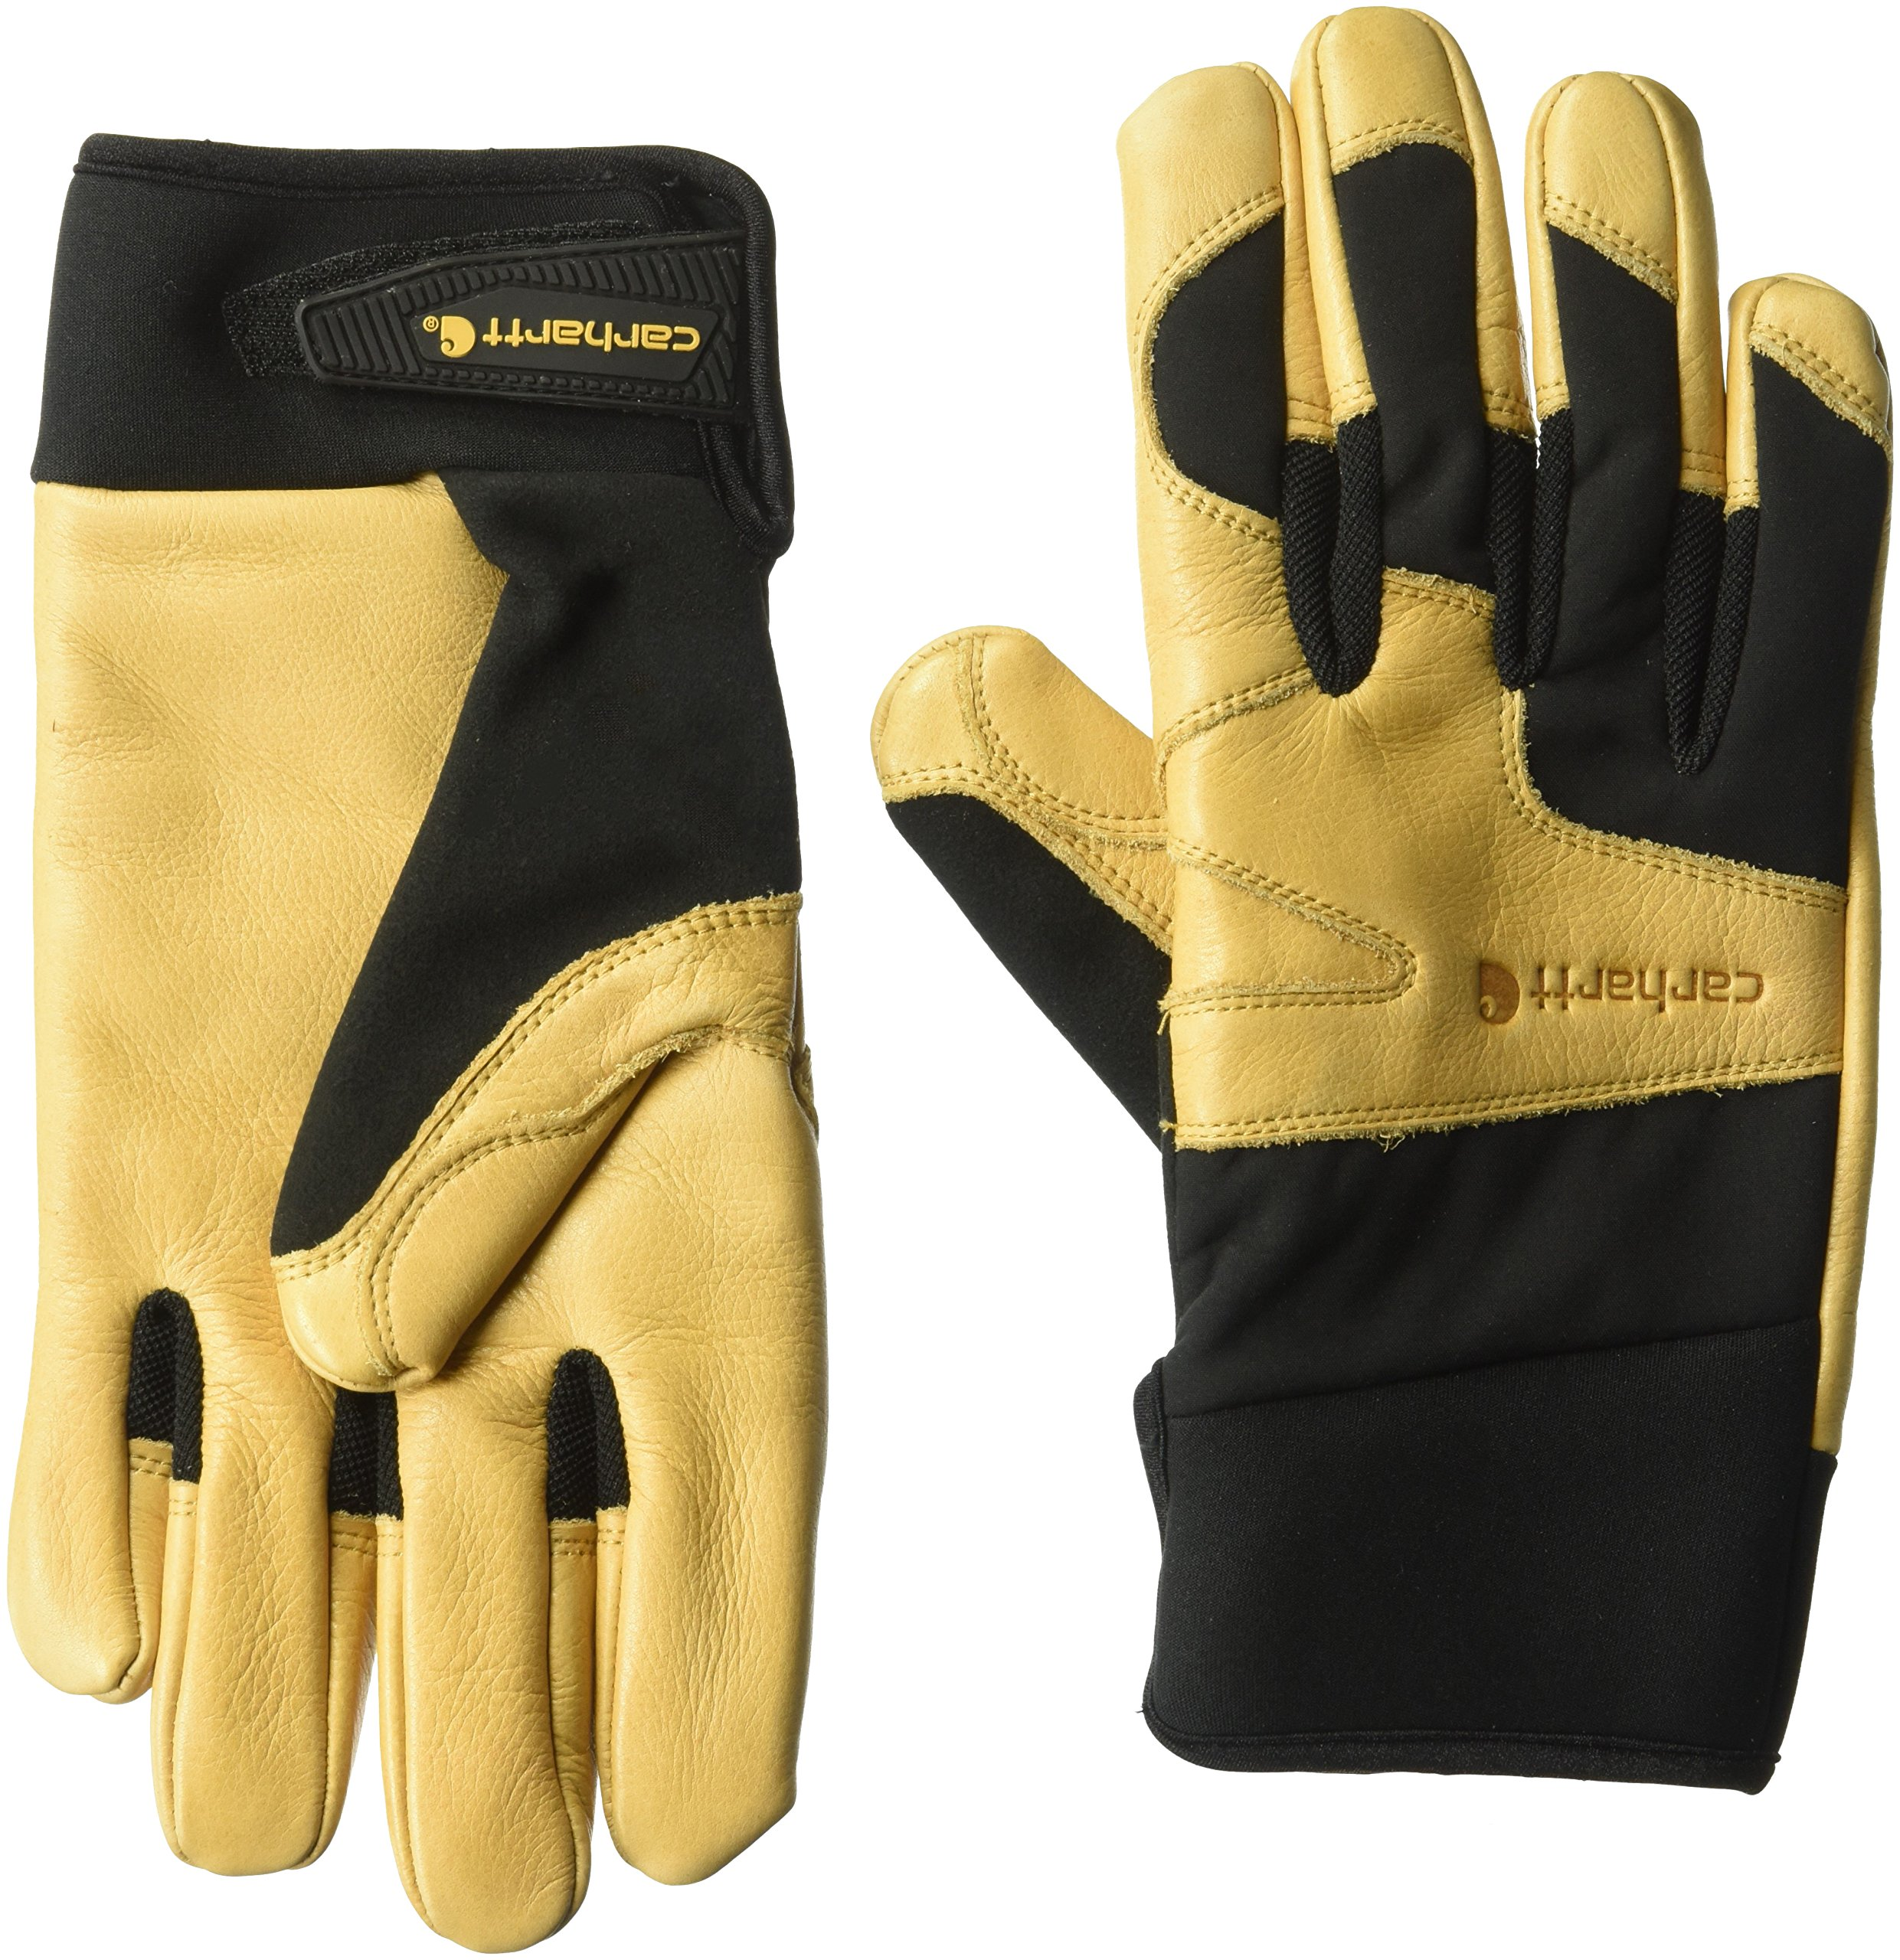 Carhartt Men's Lined Dex Cow Grain Glove, black/Brown, Medium